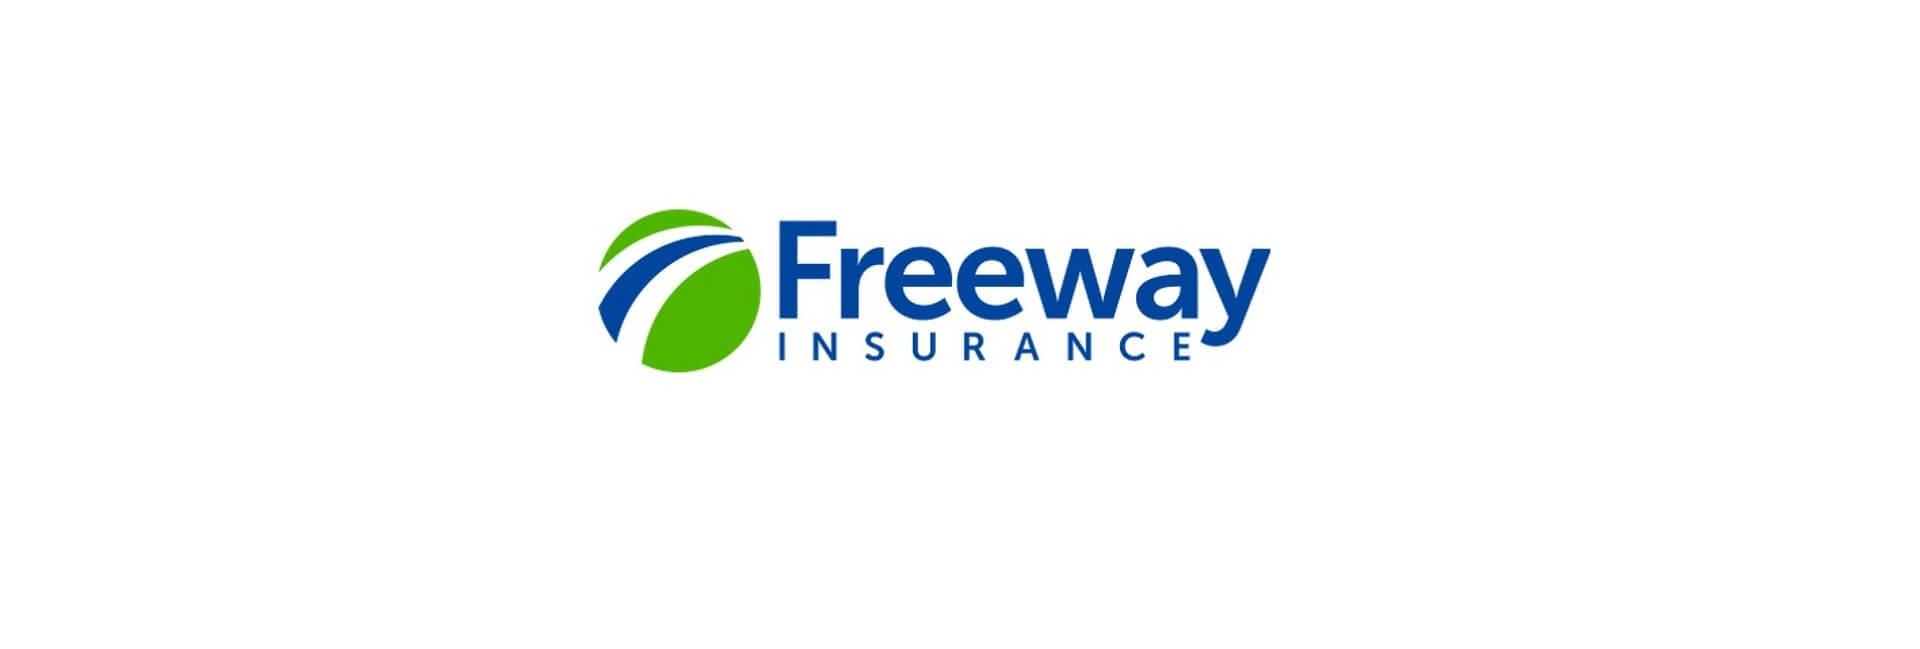 Freeway Insurance Windhaven Insurance